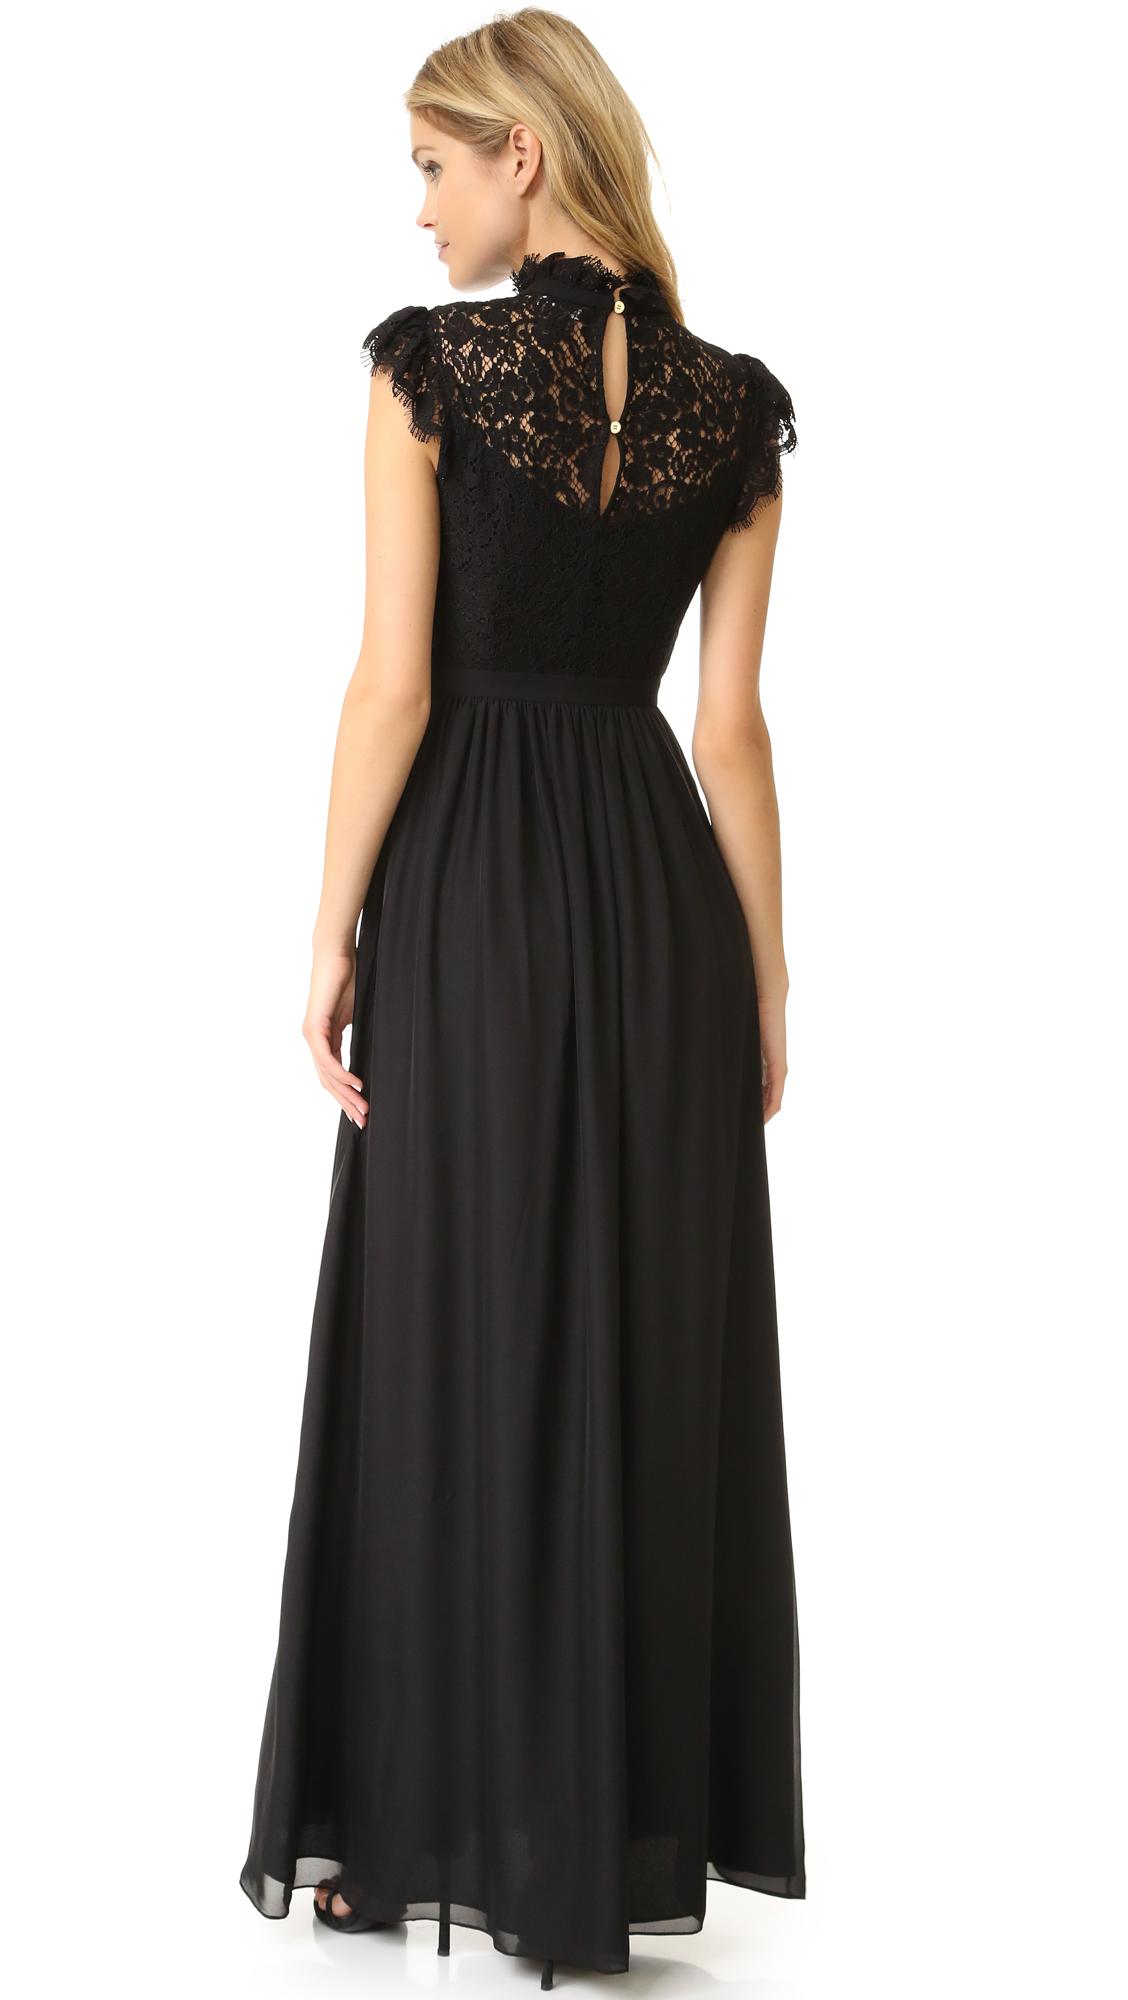 a768a8b16b9 Rachel Zoe Lace Paneled Gown